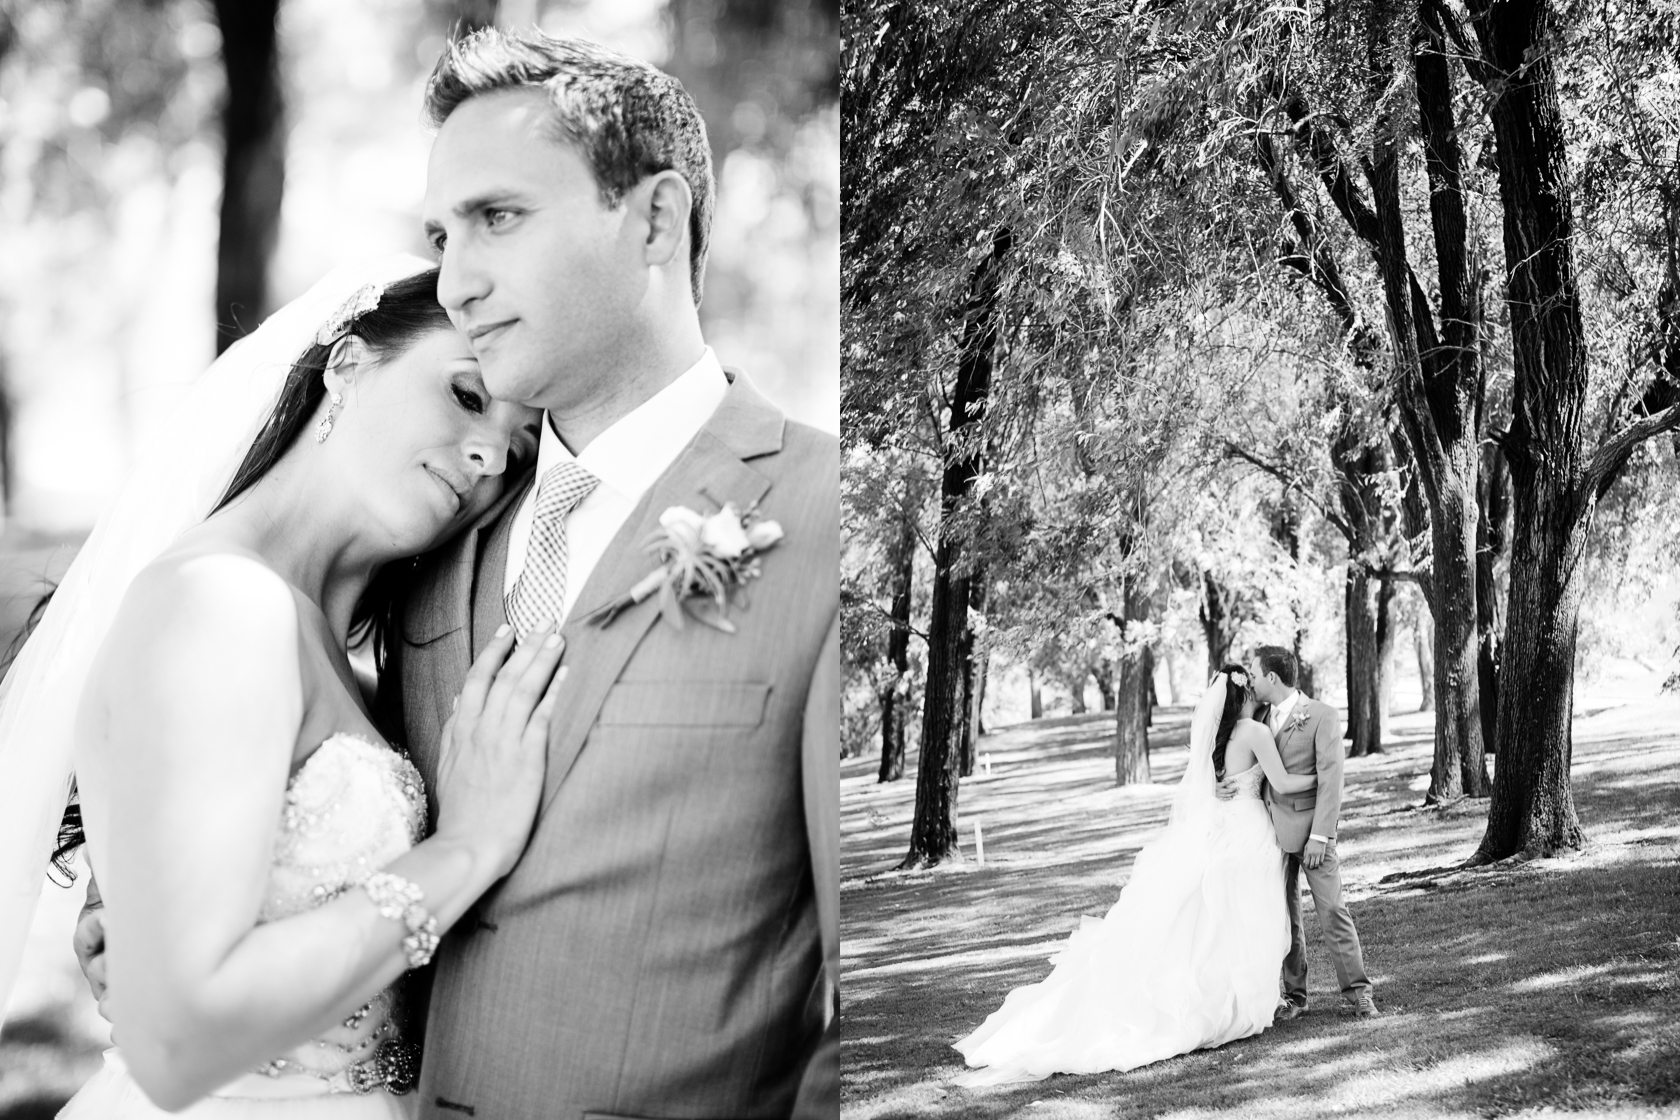 Temecula_Creek_Inn_Wedding_032.jpg